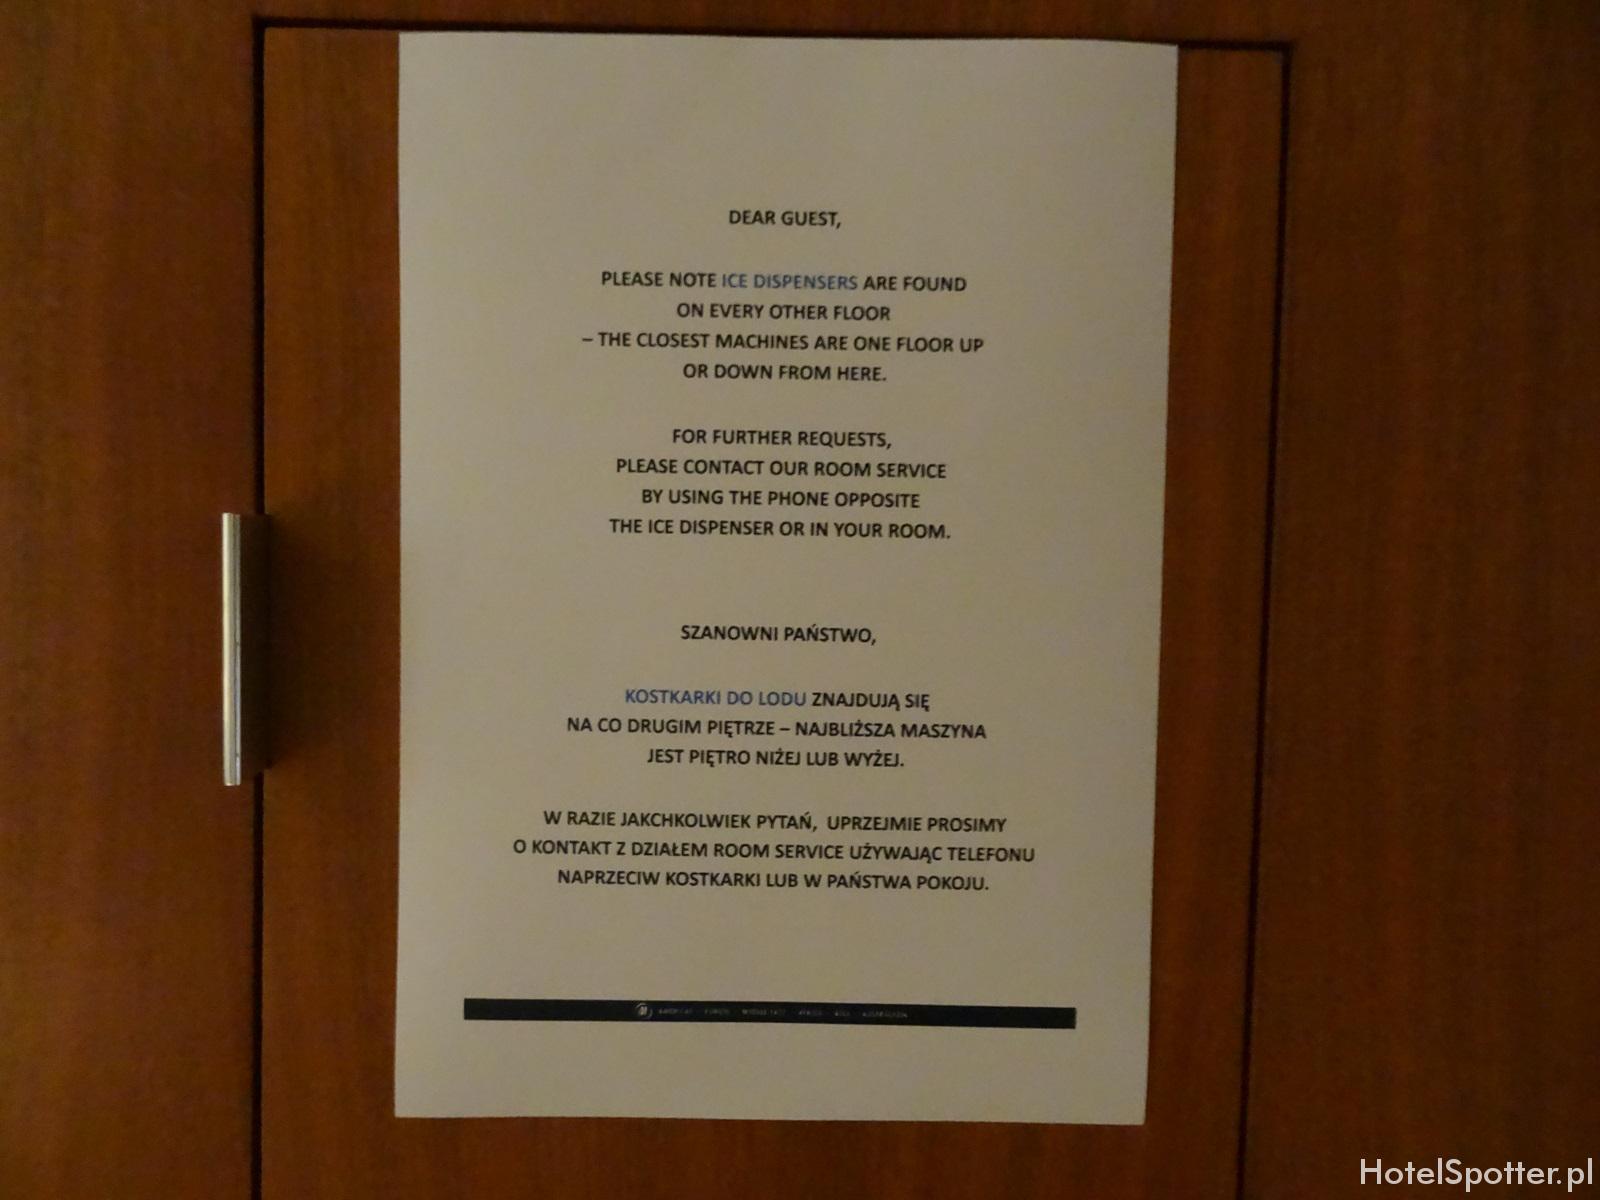 Hilton Warsaw Hotel - kostkarka do lodu